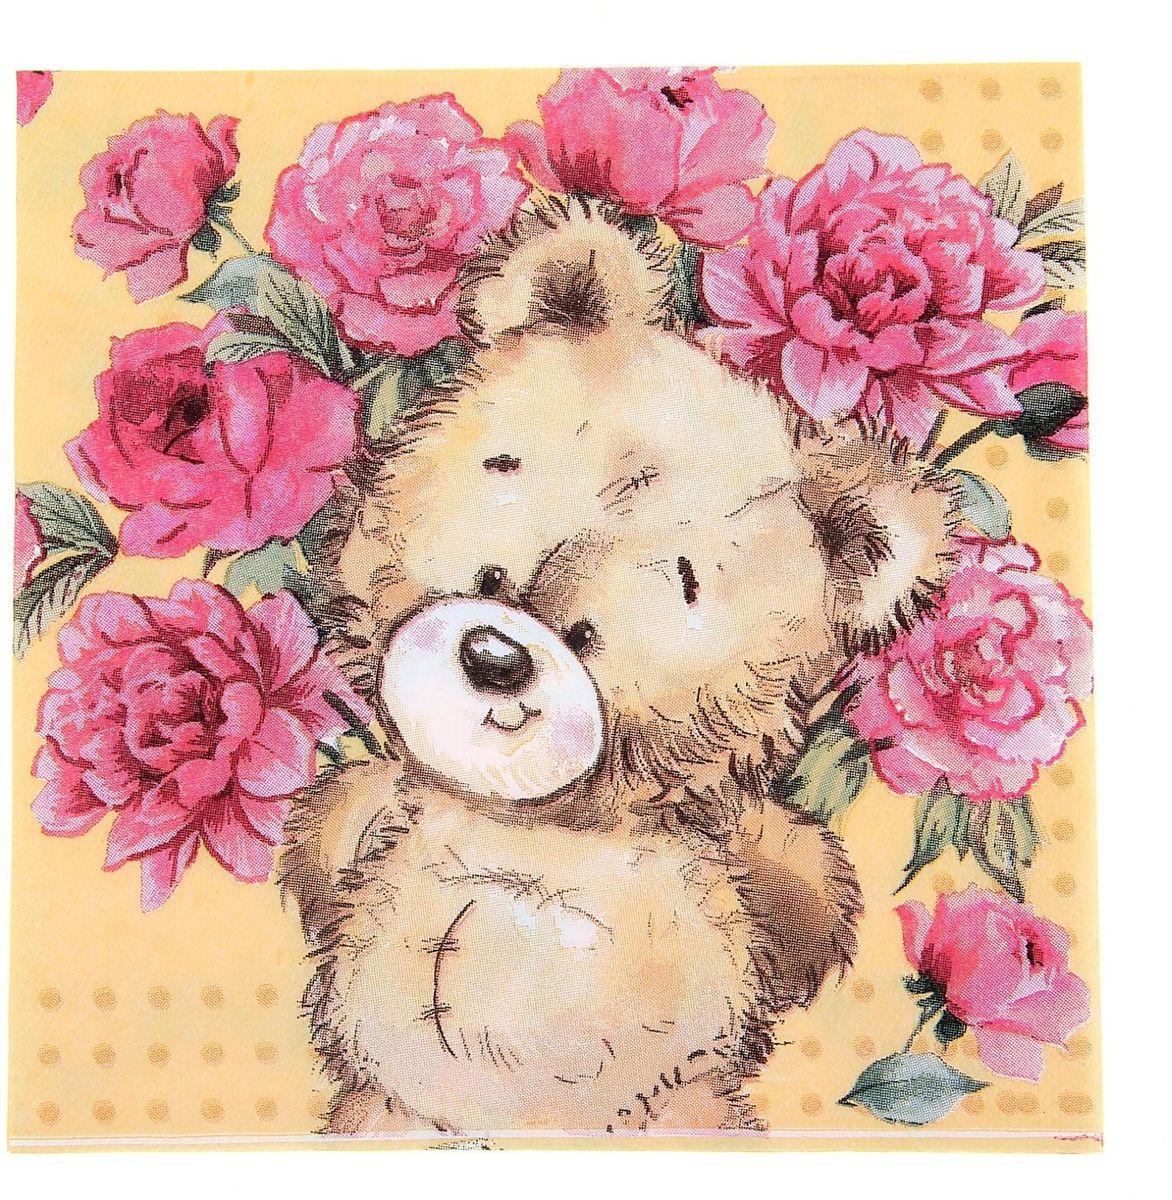 Картинка, открытки с мишками с цветами